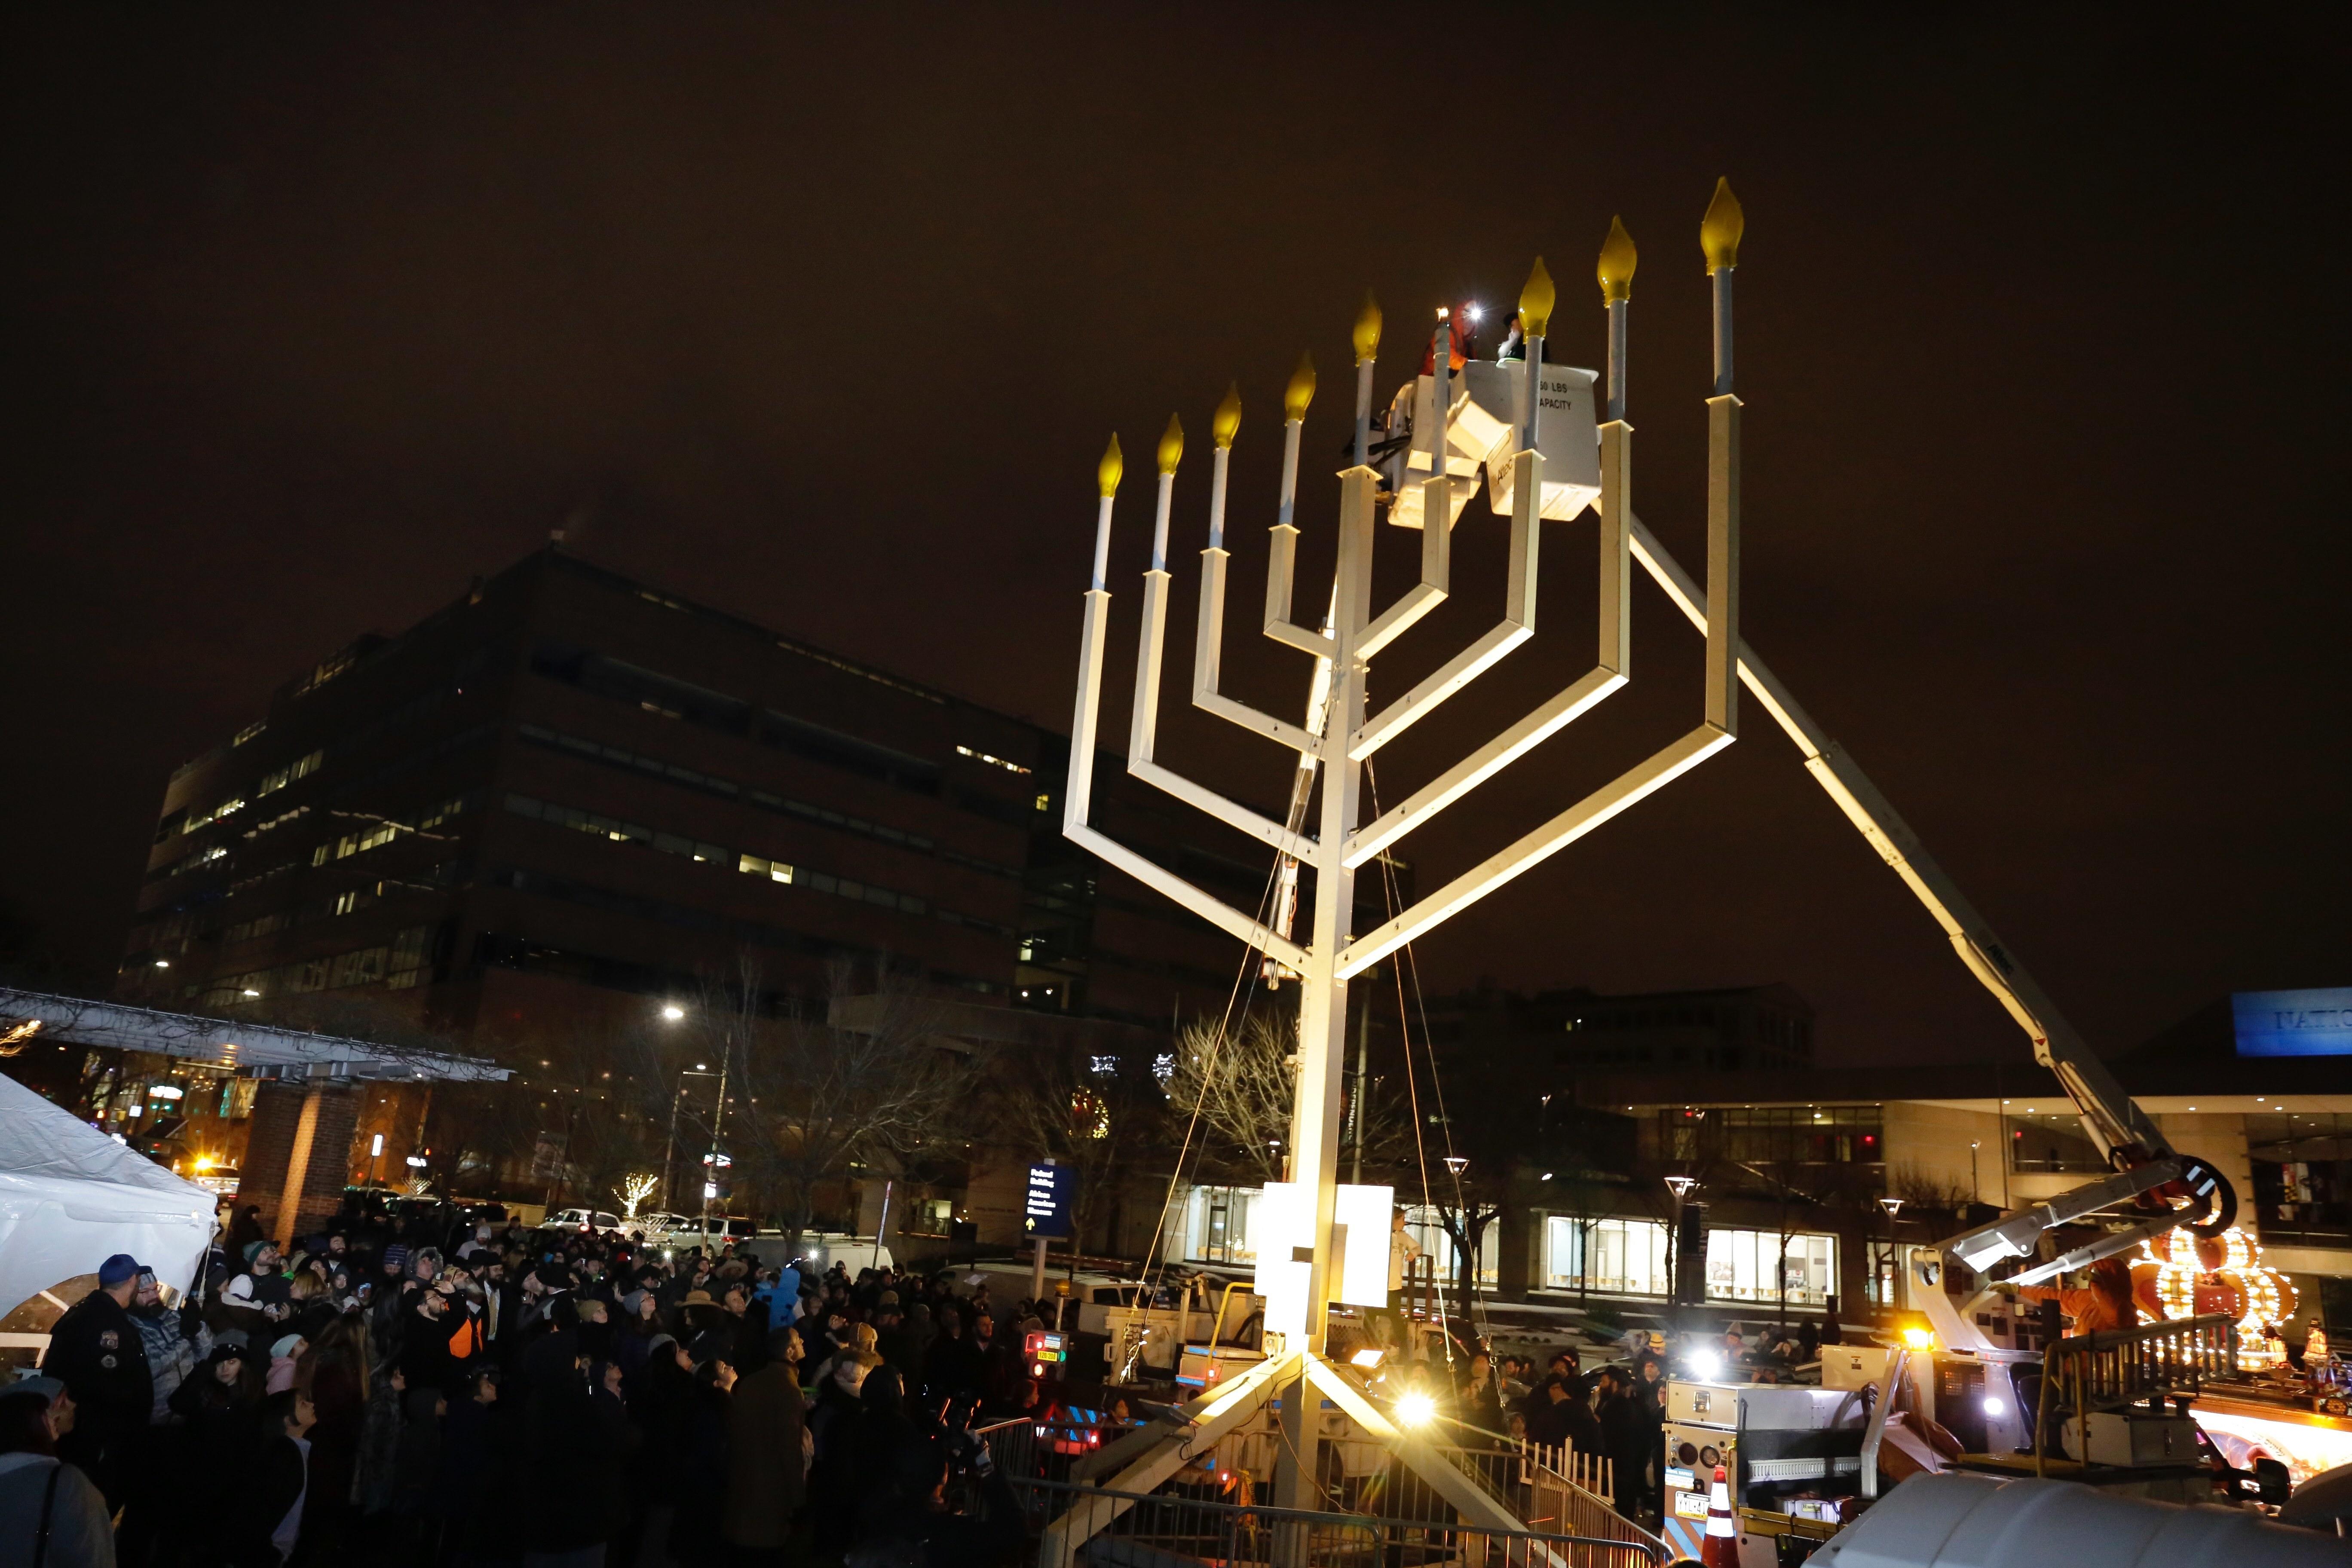 Chabad-Lubavitch Rabbi Abraham Shemtov prepares for the lighting of the Hanukkah menorah at Independence National Park.